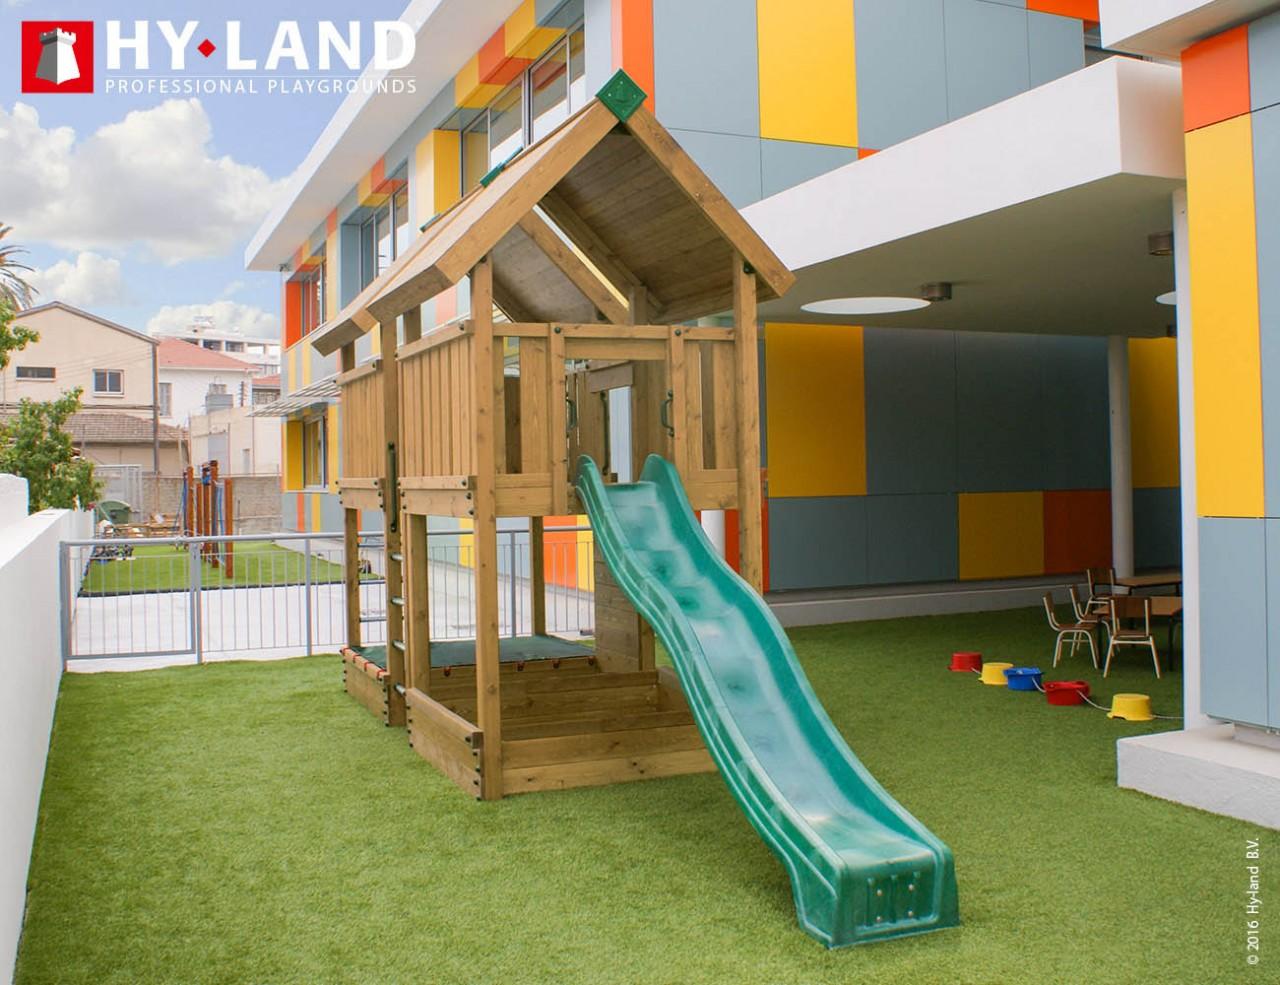 Spielturm Hy-Land P4